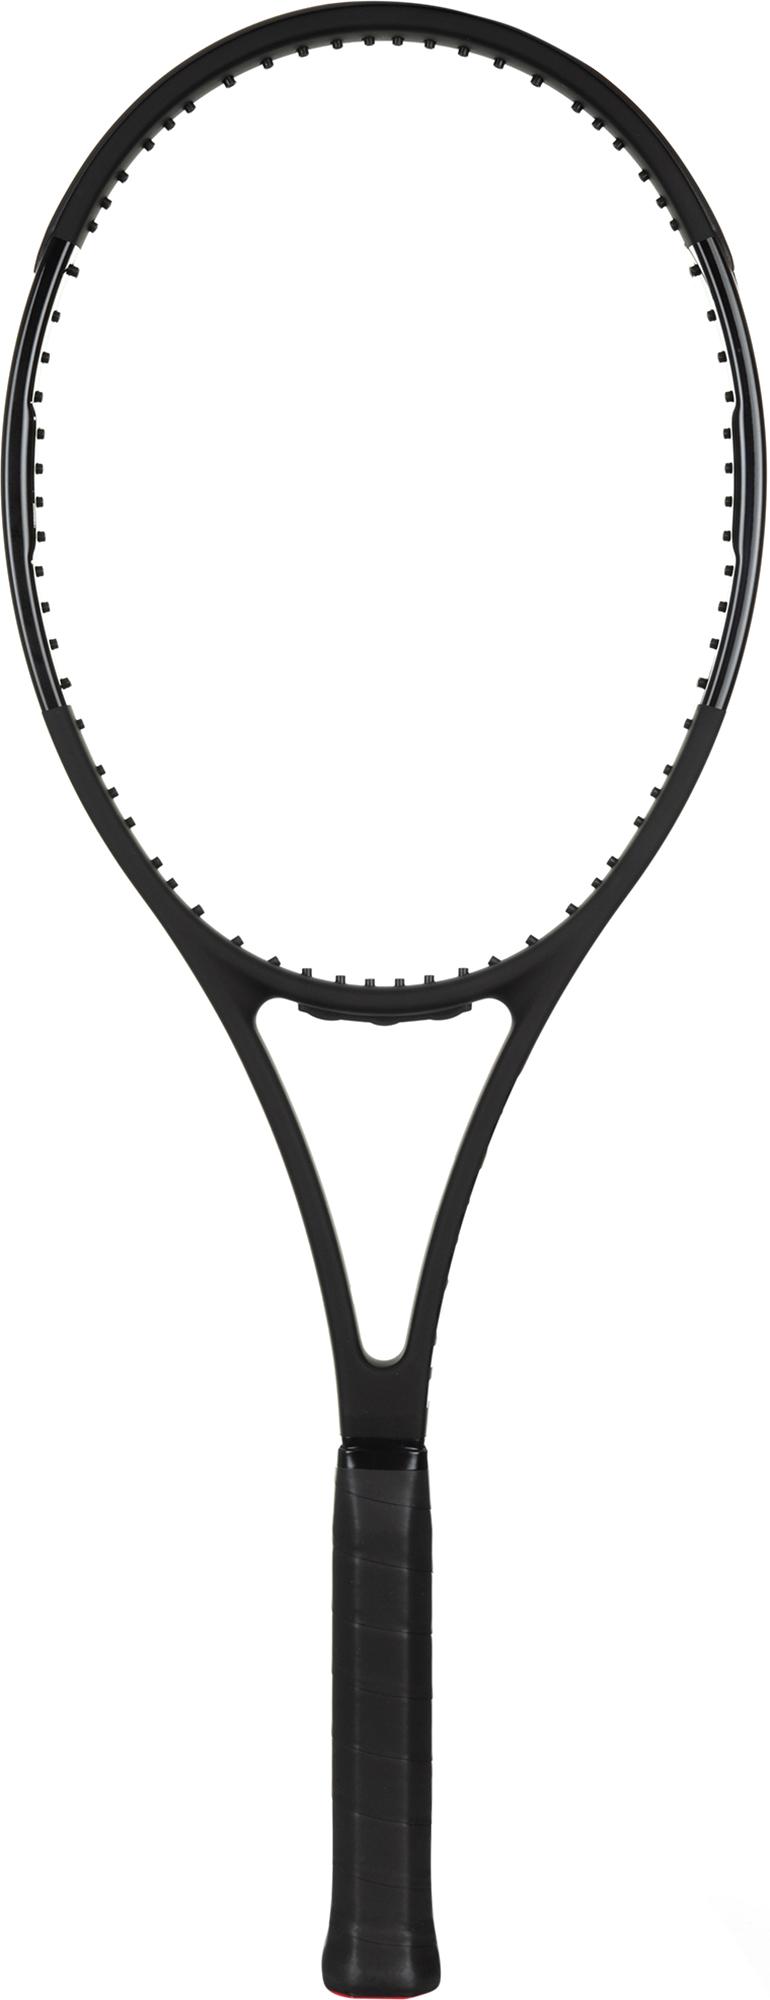 Wilson Ракетка для большого тенниса Wilson Pro Staff, размер 3 wilson ракетка для большого тенниса детская wilson roger federer 21 размер без размера